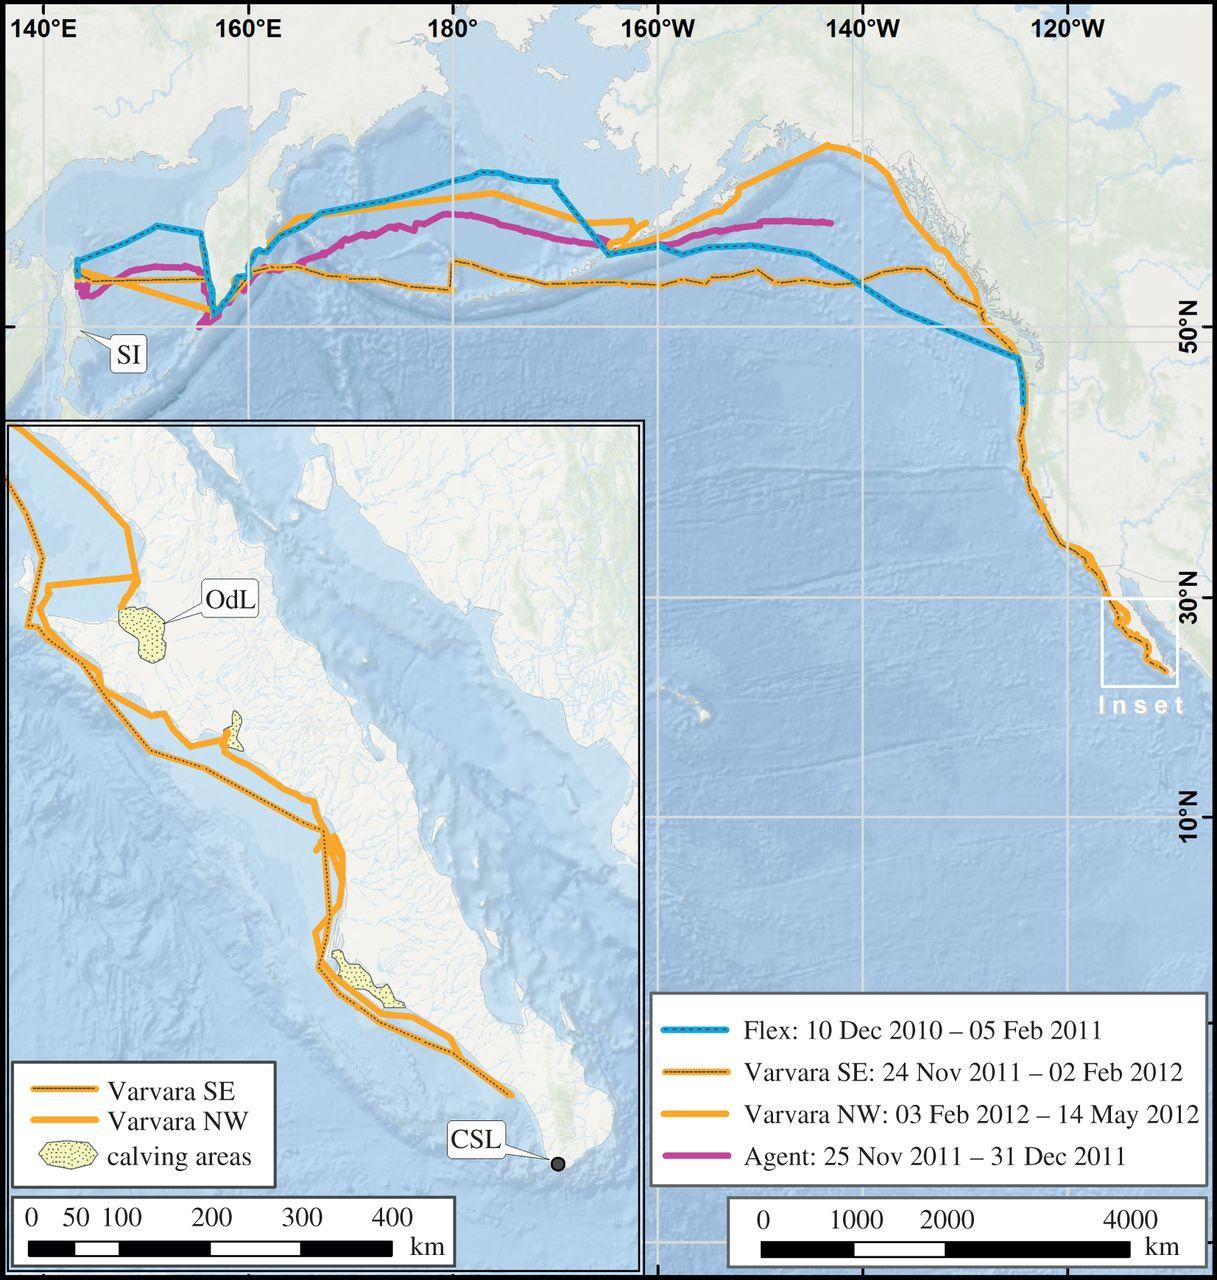 Migration de la baleine grise Varvara record